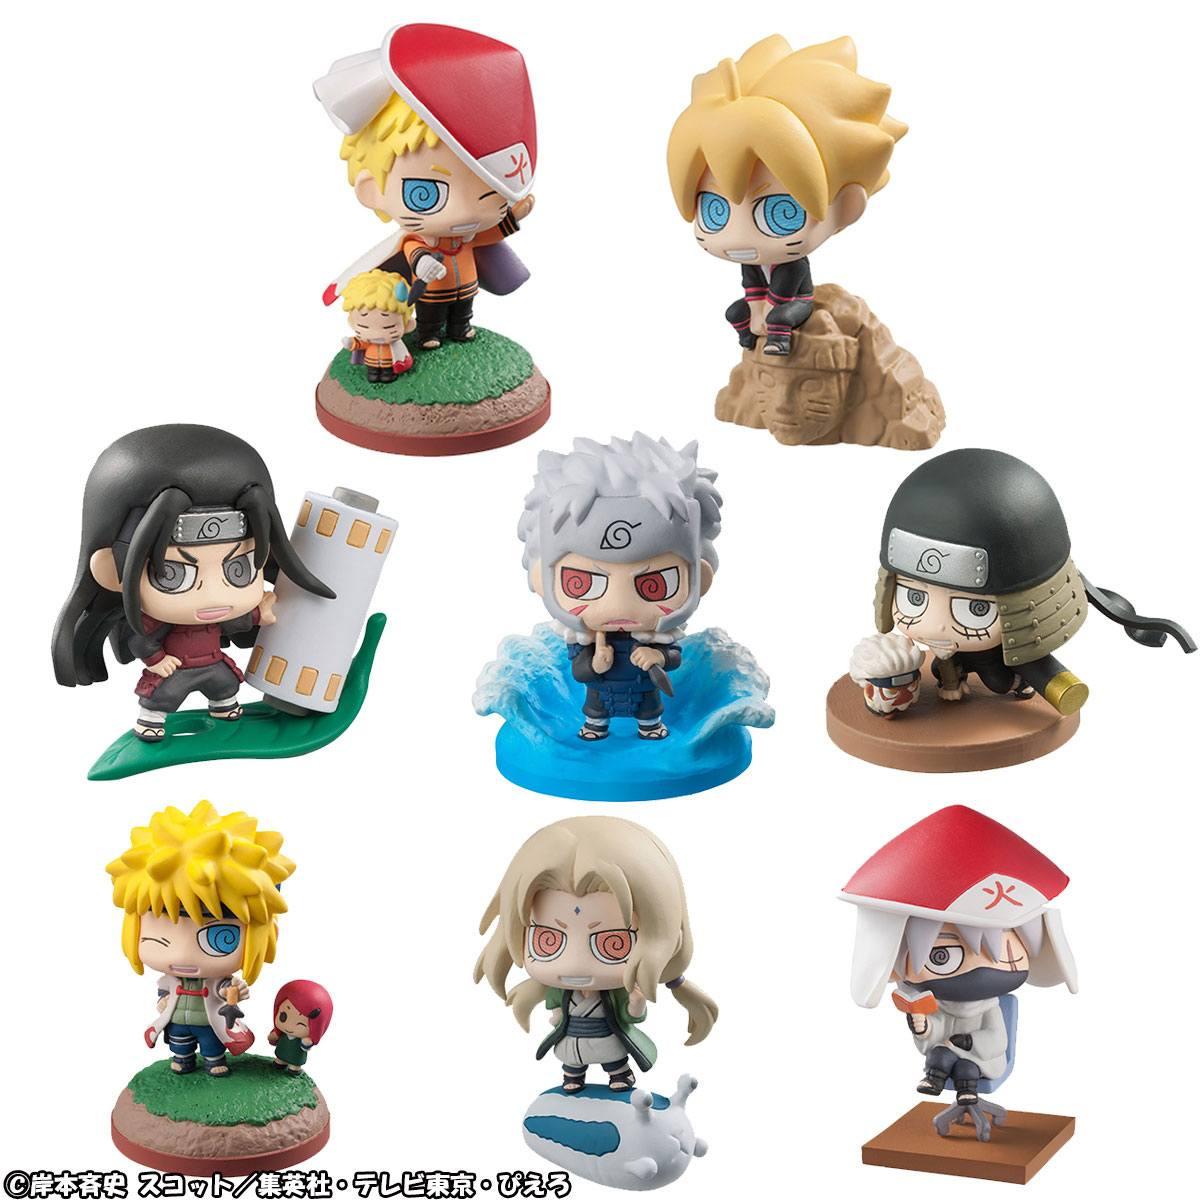 Boruto Naruto Next Generation Petit Chara Land Trading Figure 6 cm Assortment Boruto & Hokage (8)